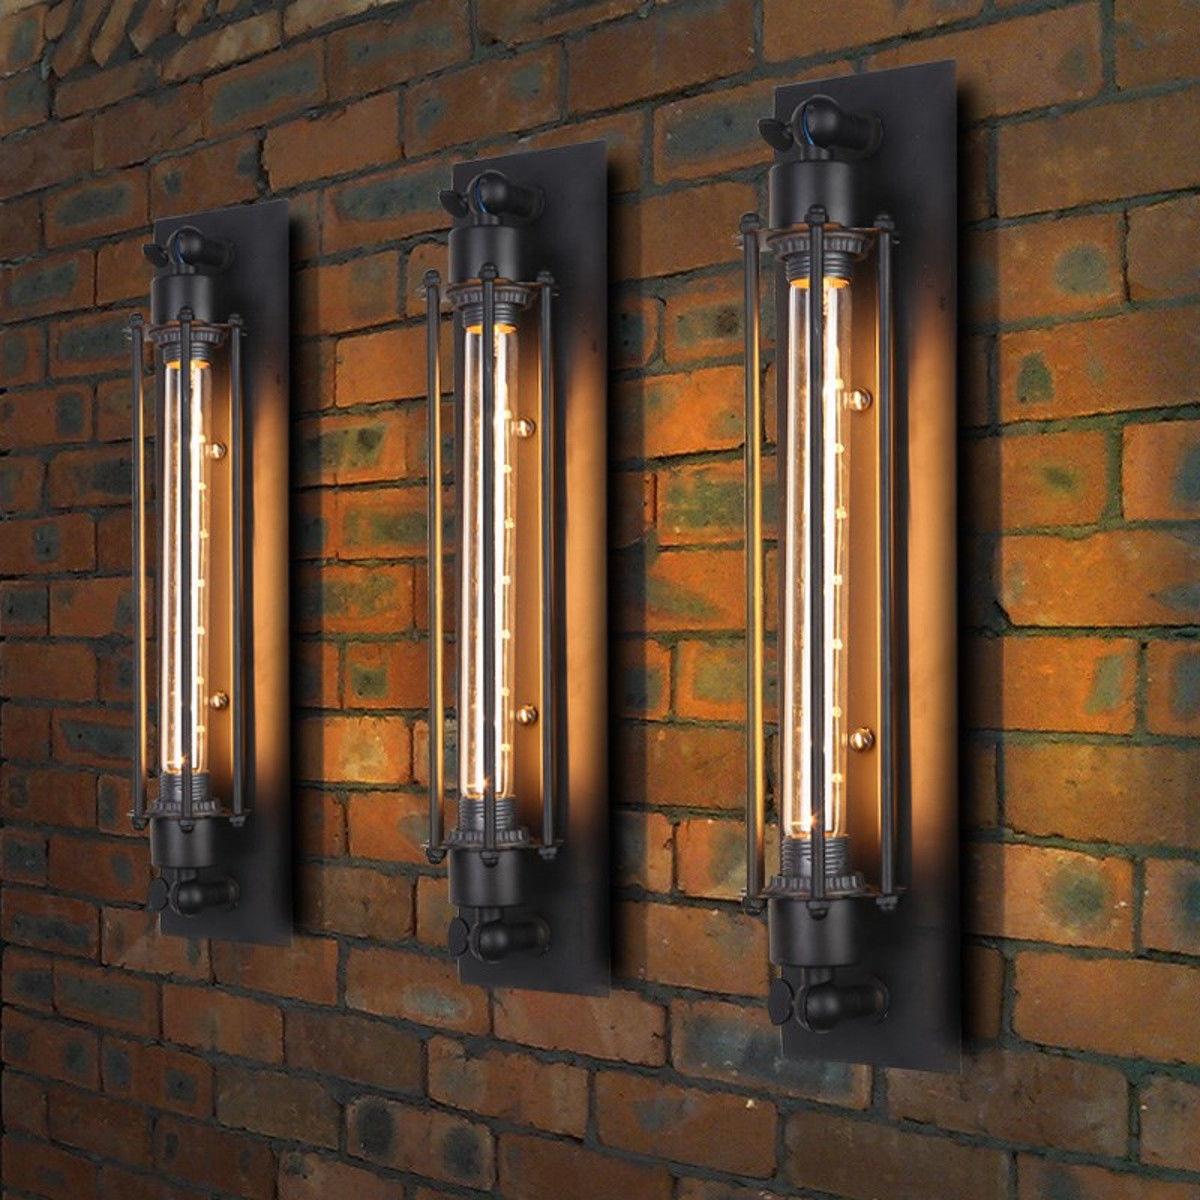 Vintage Edison LED Wall Light Modern Corridor Vintage Retro Industrial E27 Wall Lamp Led W filament Indoor LED Light 110 250V